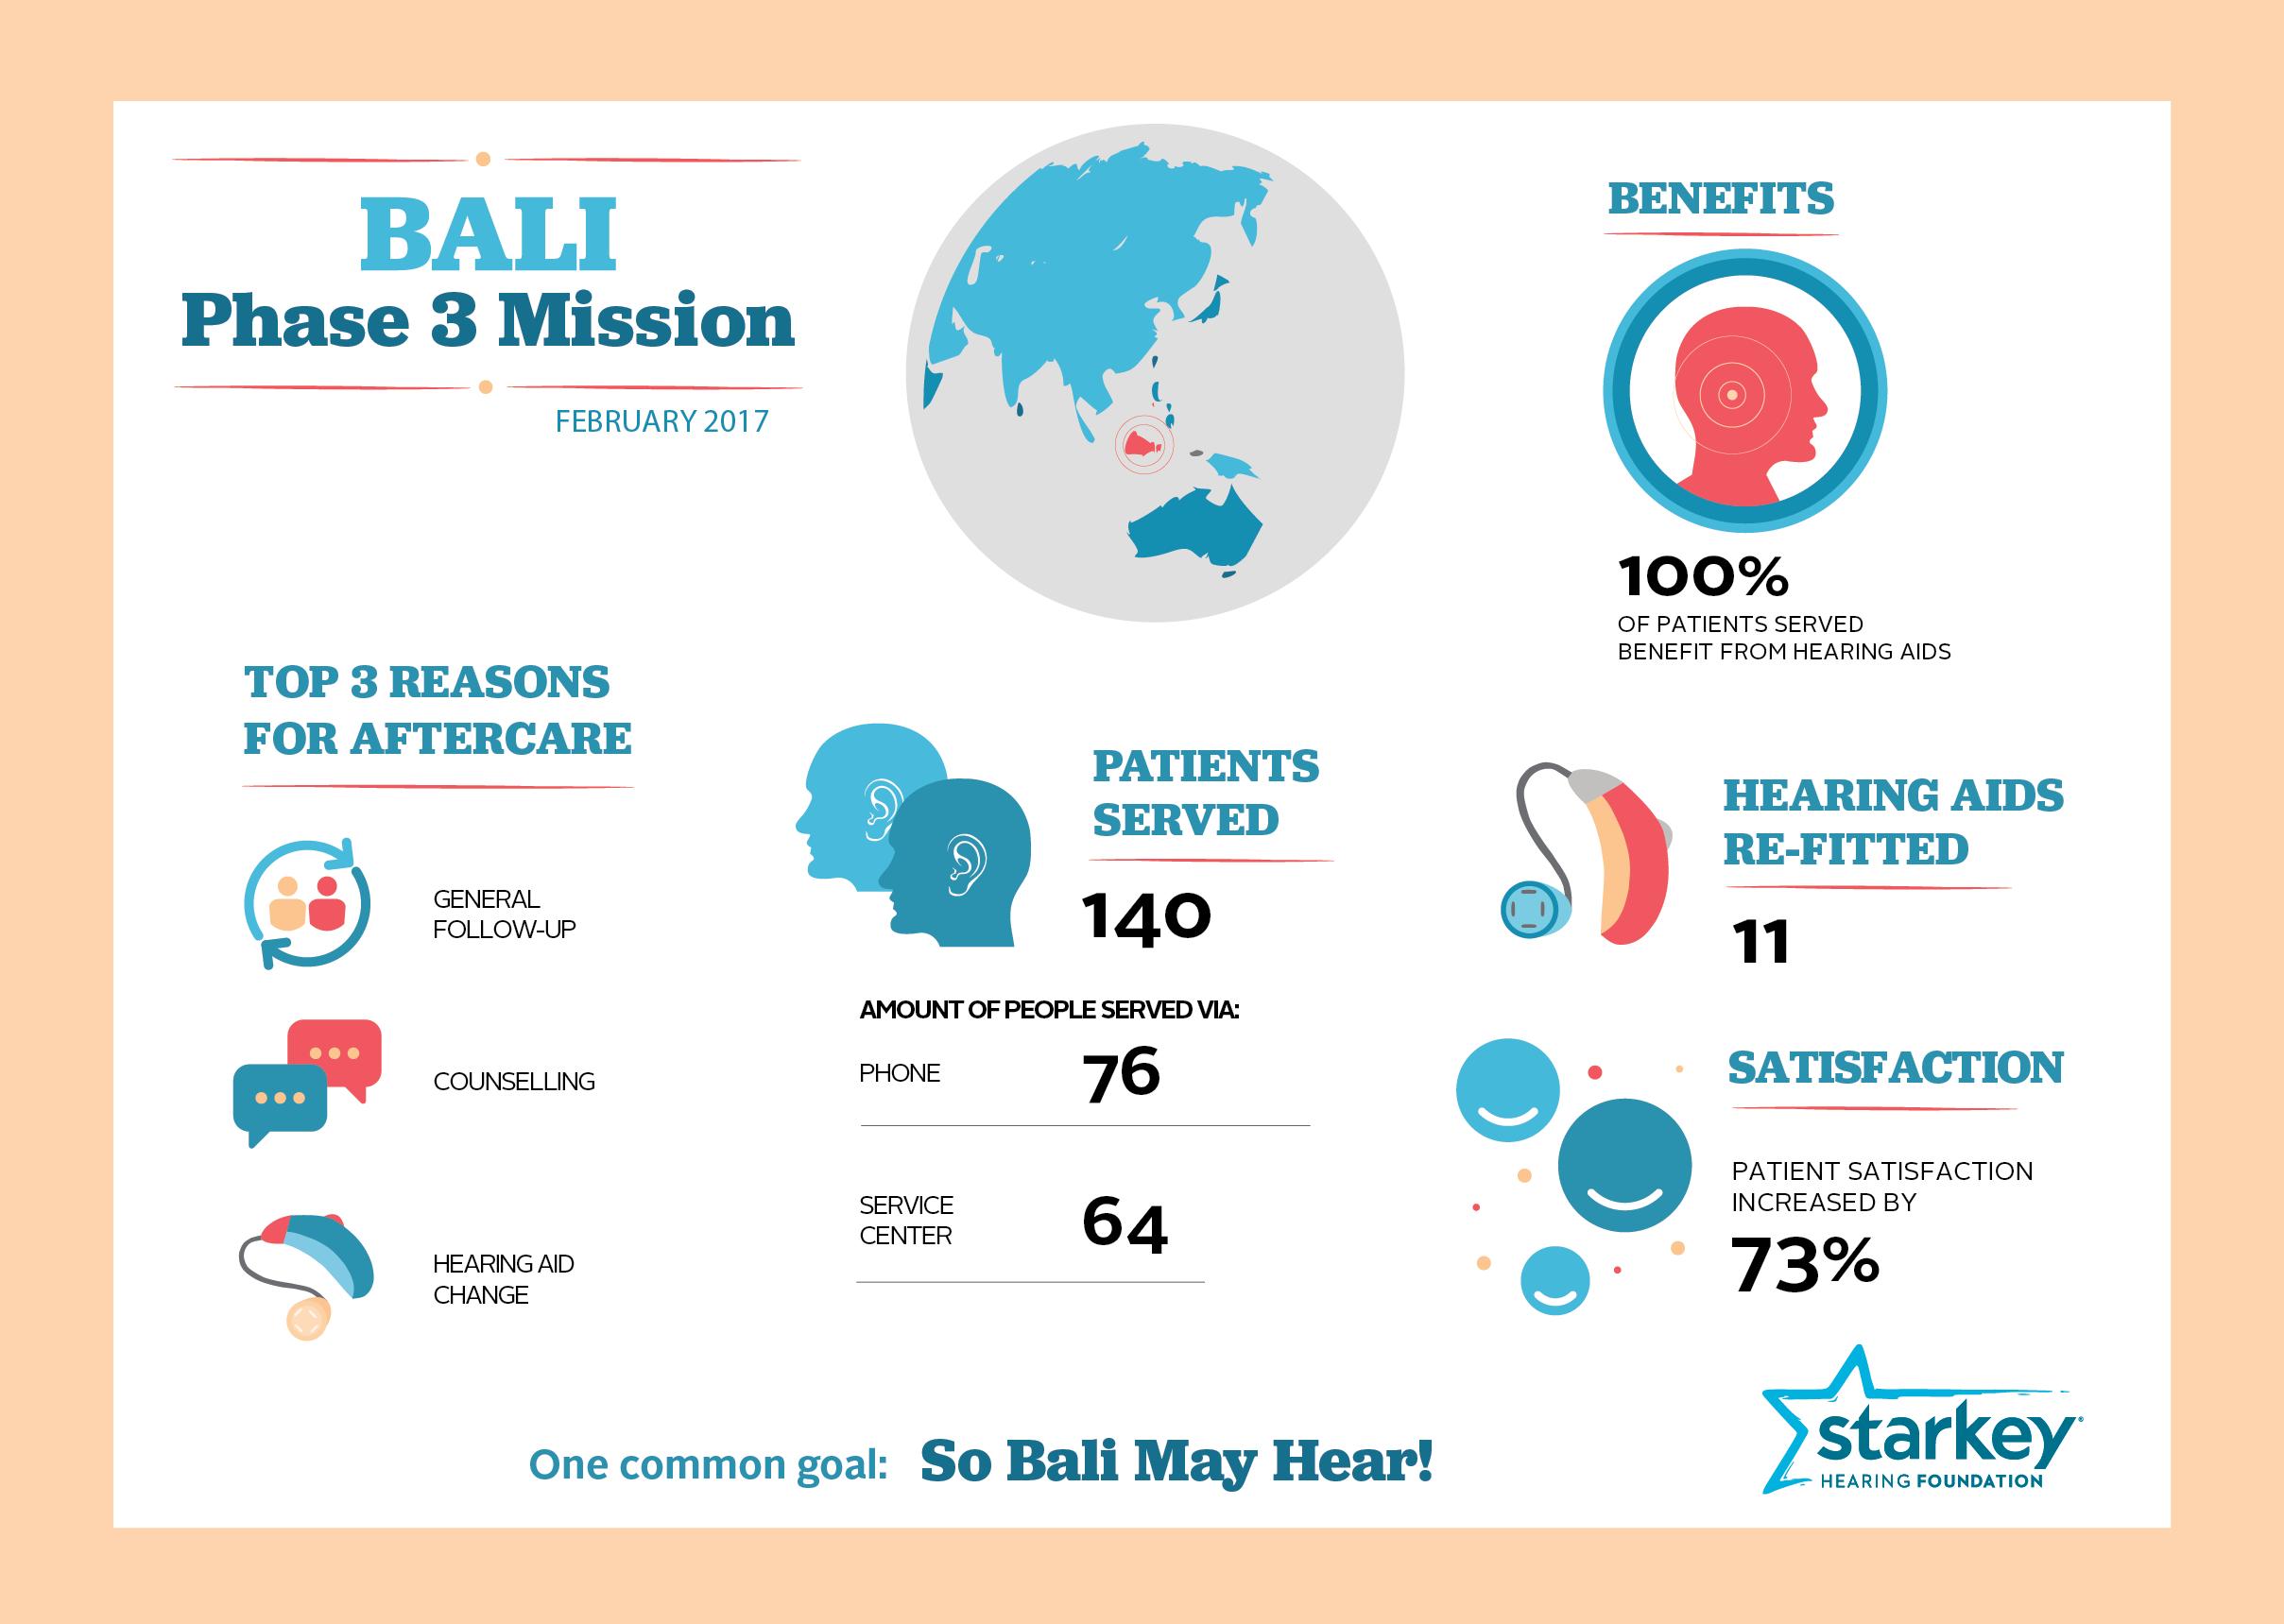 Starkey Hearing Foundation: Cambodia/Vietnam Phase 2 Mission